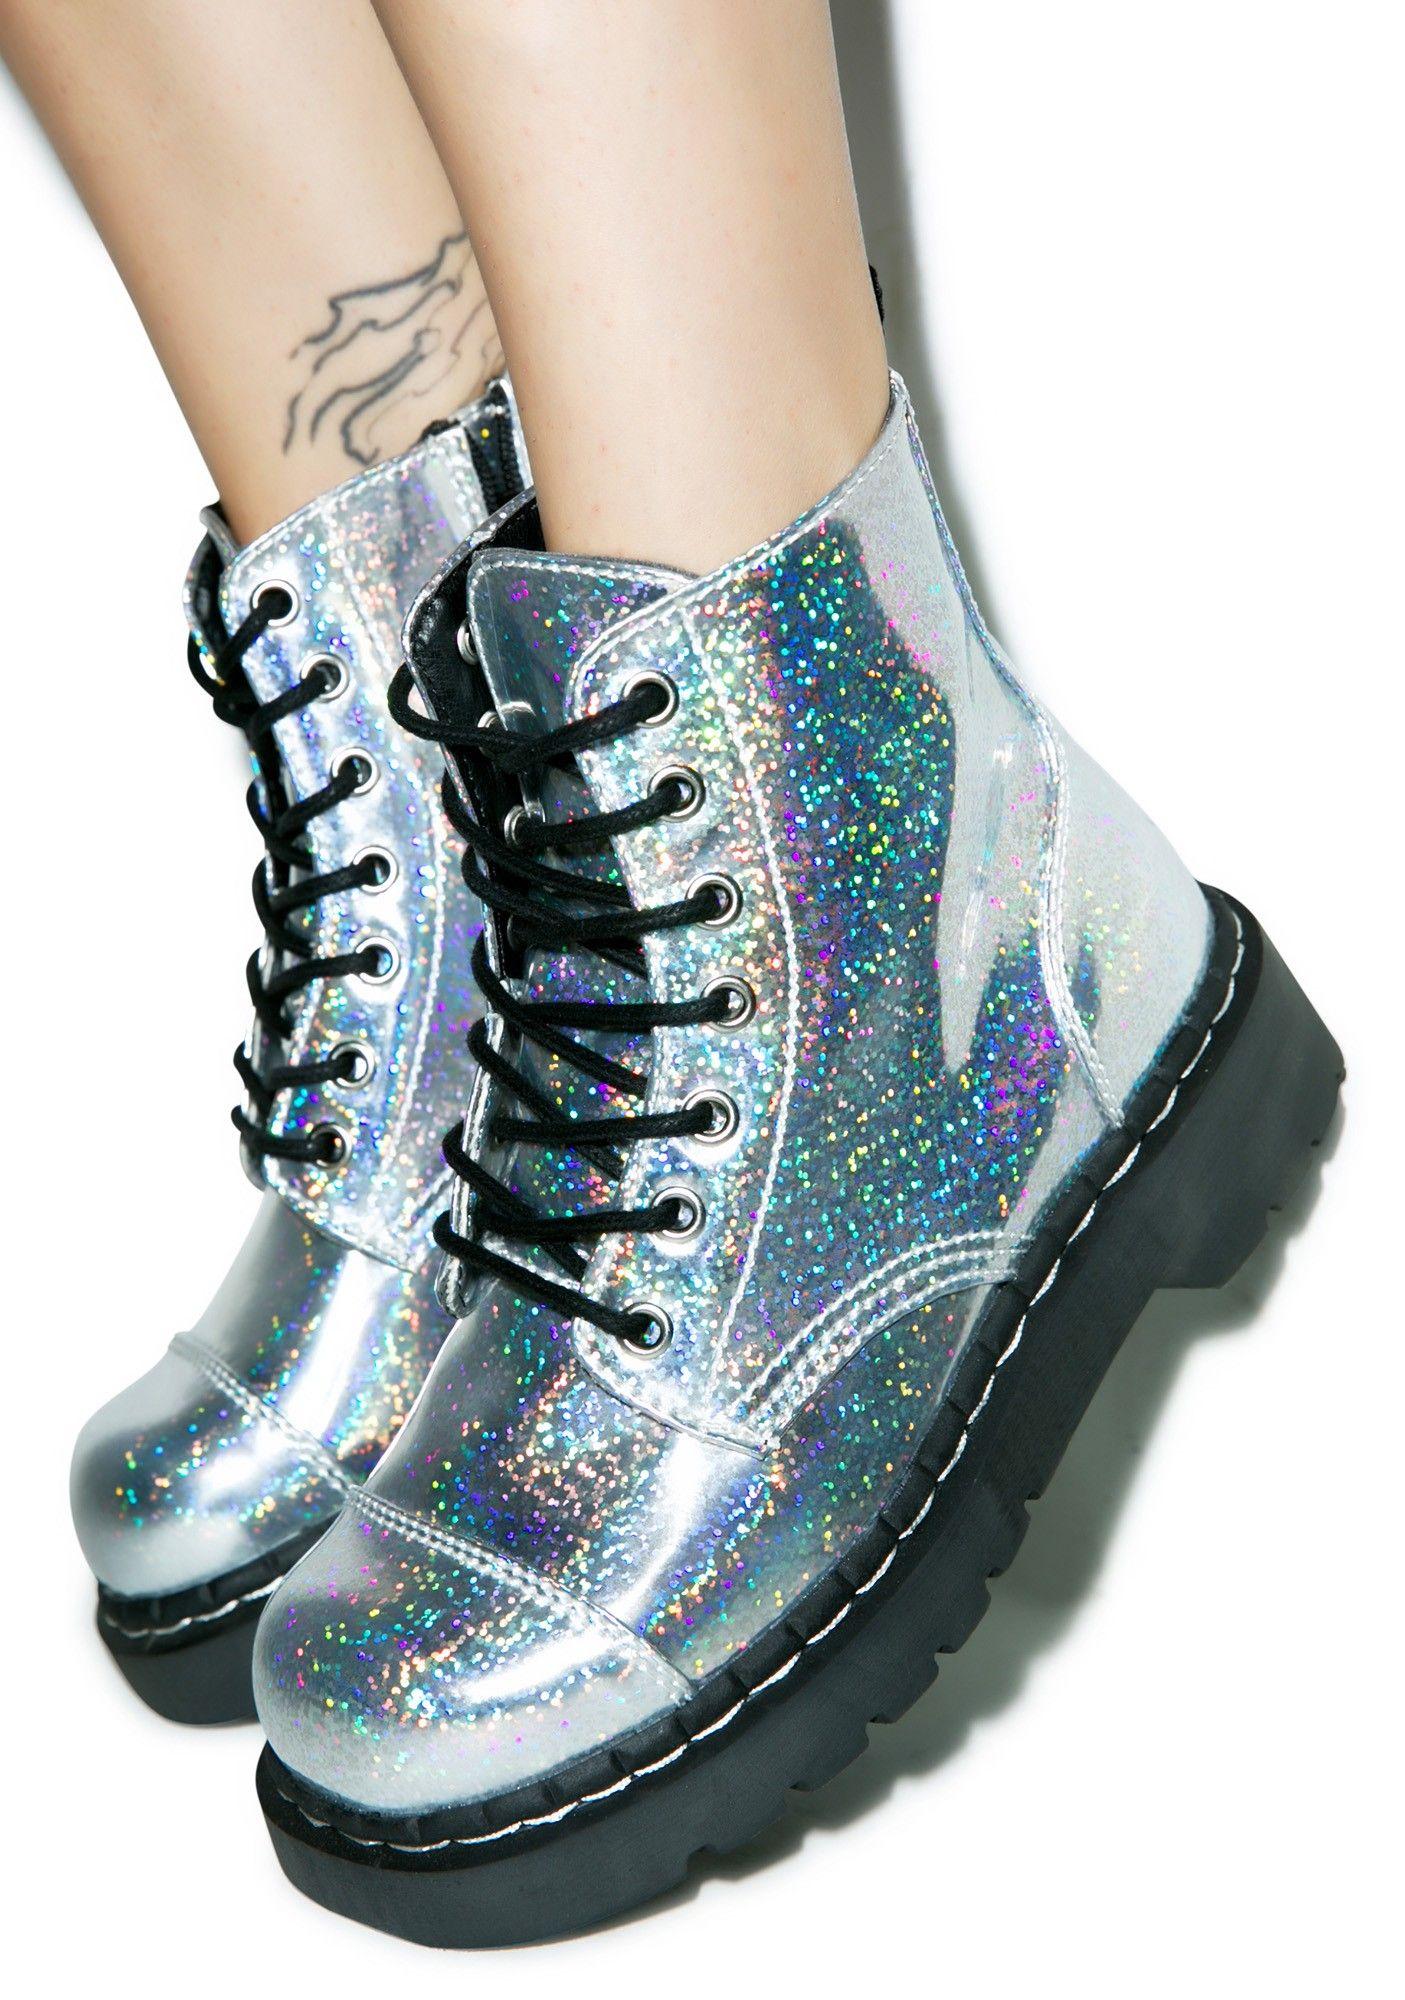 611acfec7eeab T.U.K. Hologram Anarchic 7 Eye Boots   Dolls Kill   Vintage Shoes in ...